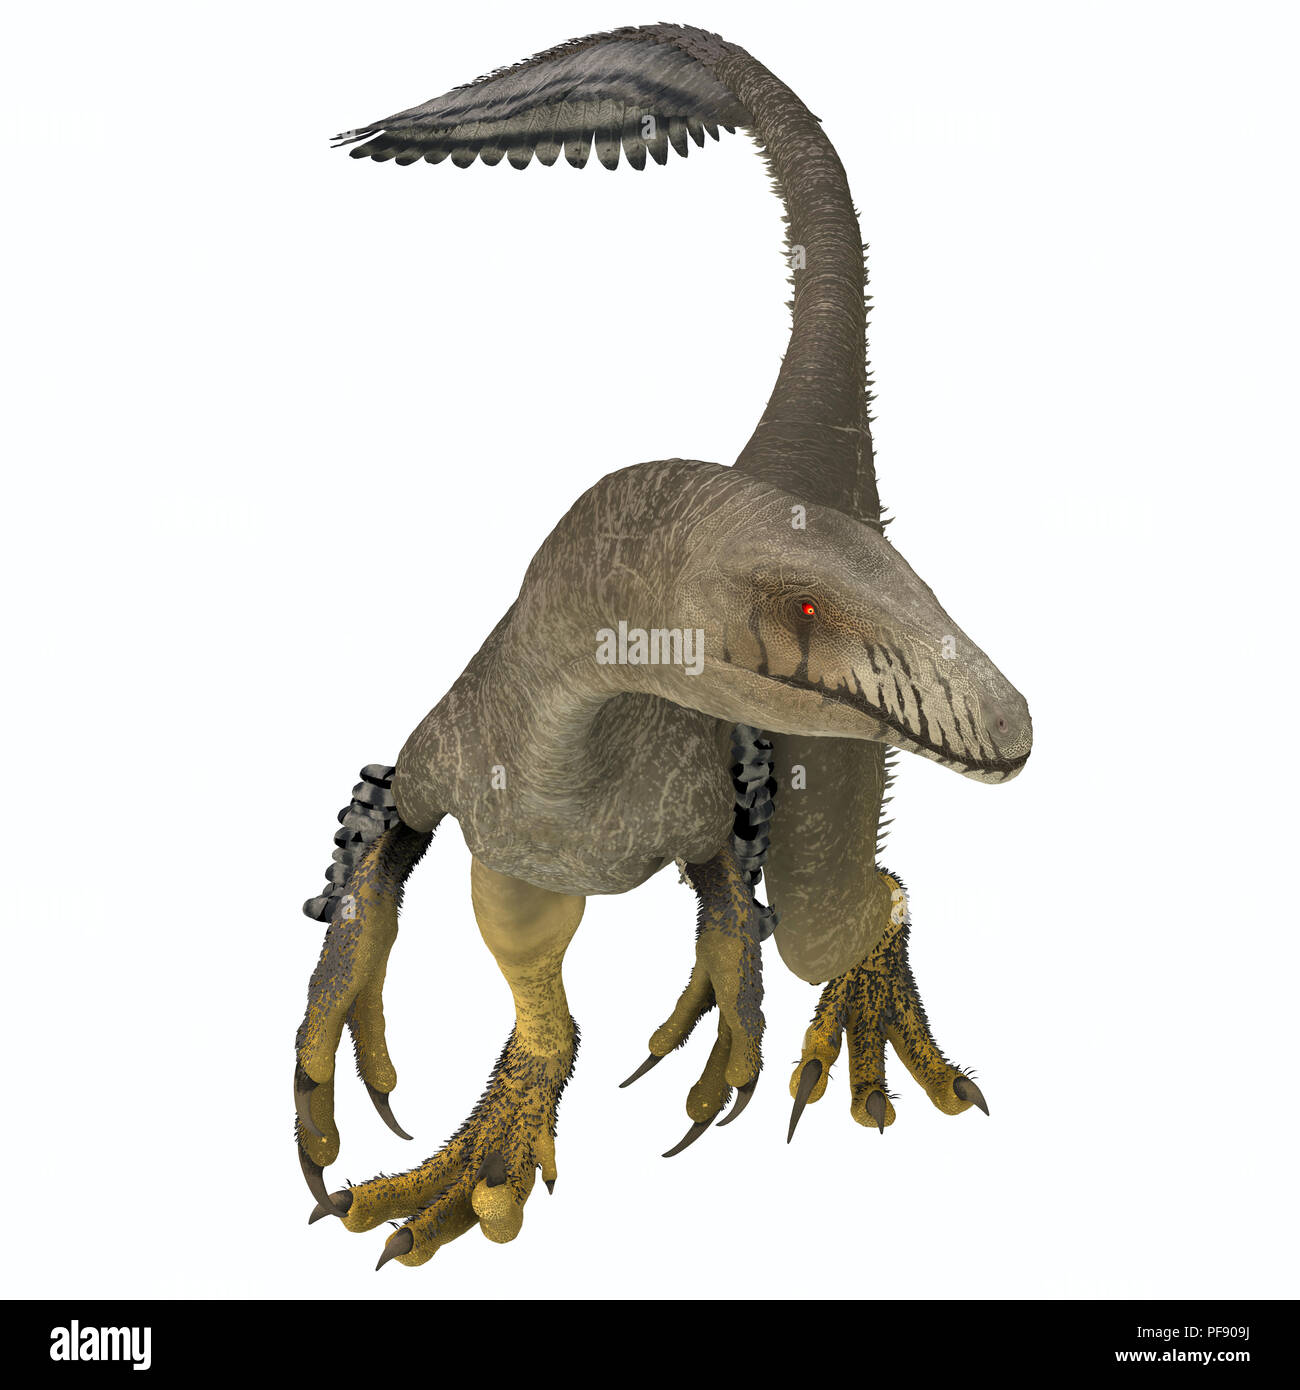 Dakotaraptor was a carnivorous dromaeosaurid theropod dinosaur that lived in South Dakota, North America during the Cretaceous Period. - Stock Image